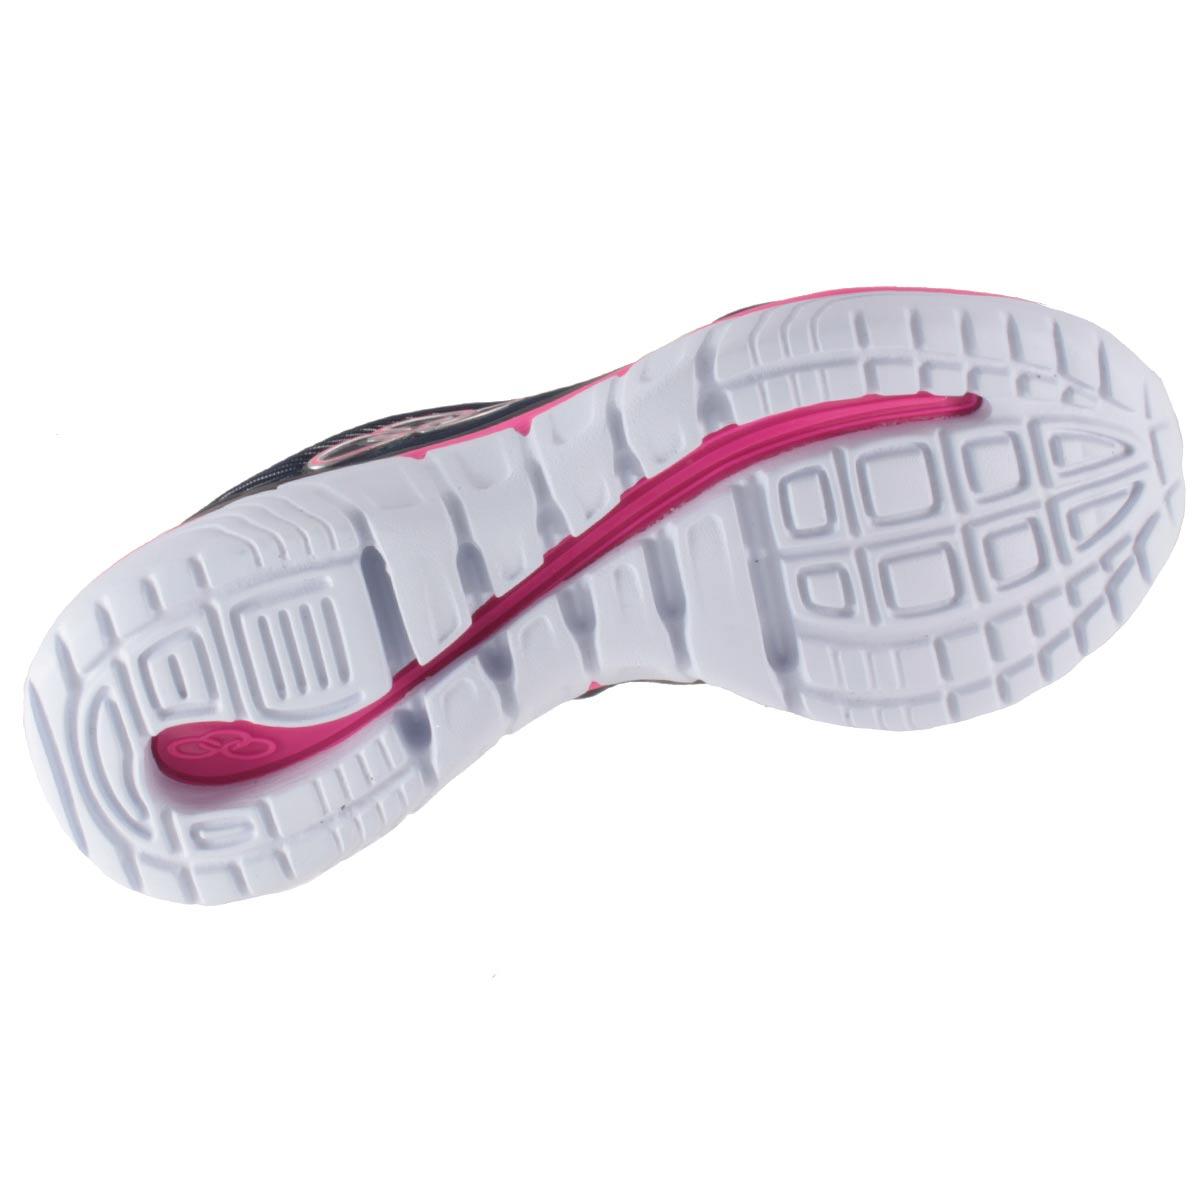 ... Tênis Olympikus Mist 2 Feminino Caminhada Corrida Running 344 2306a4645701b